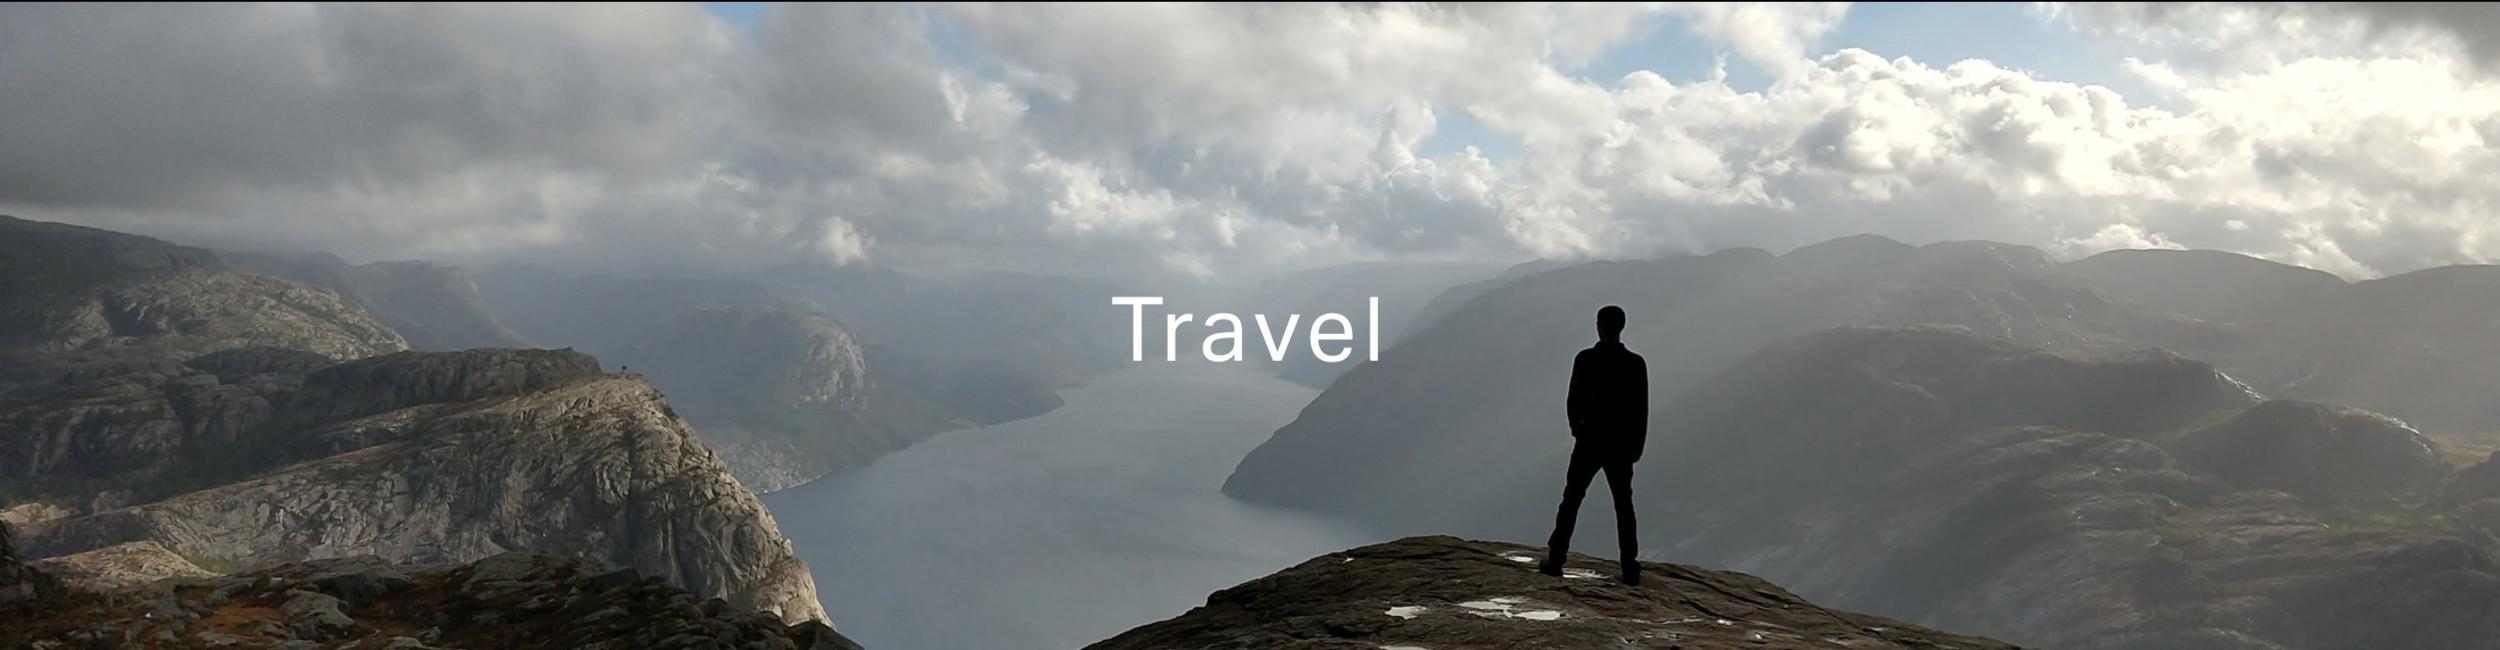 Travel_Blog.png